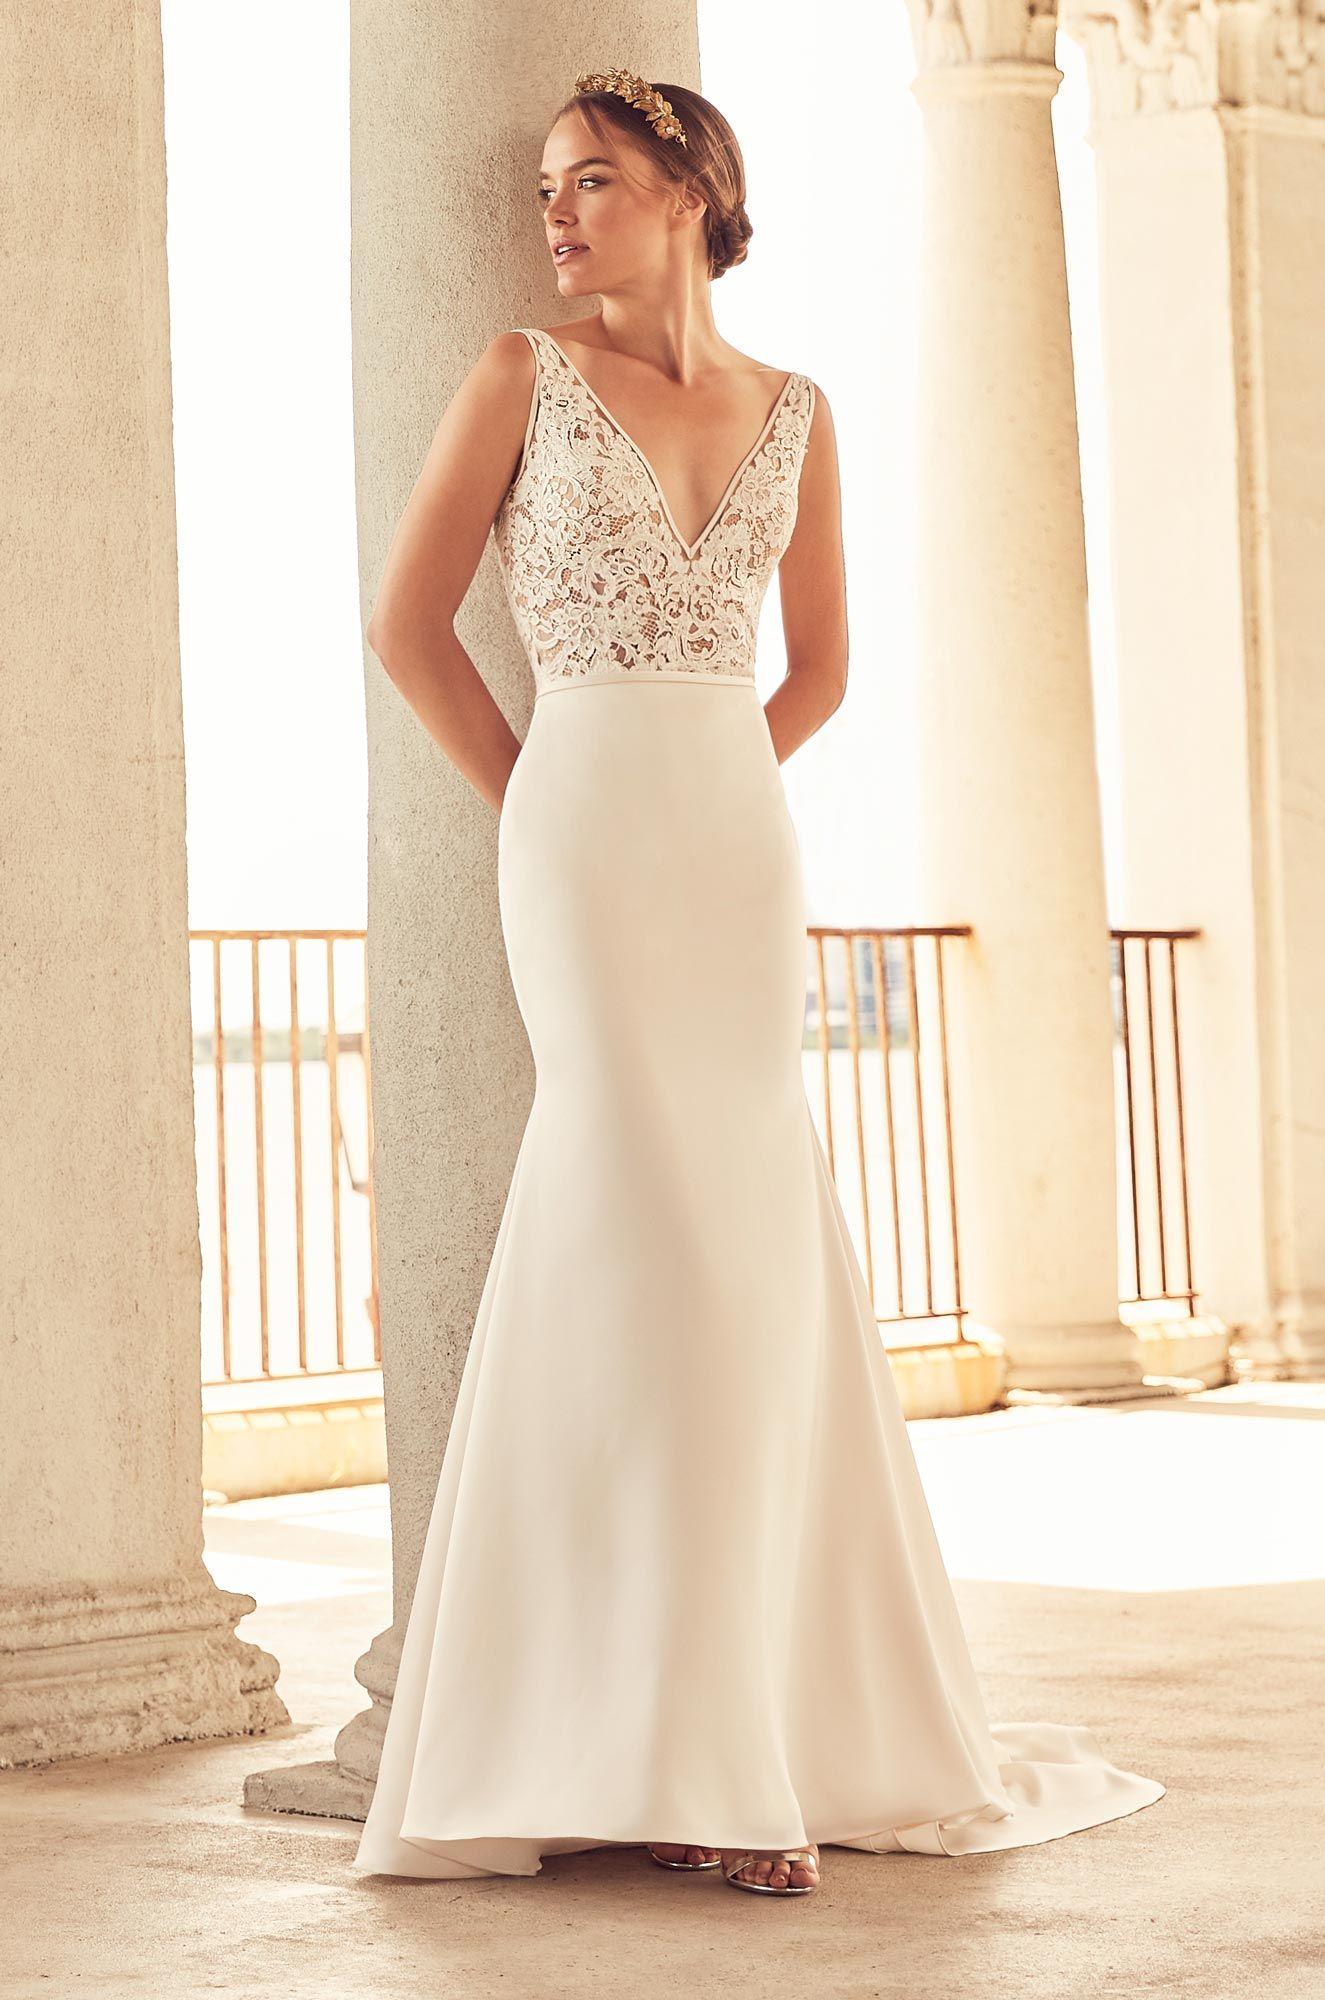 924f9c841 Sheer Bodice Wedding Dress - Style  4787 in 2019